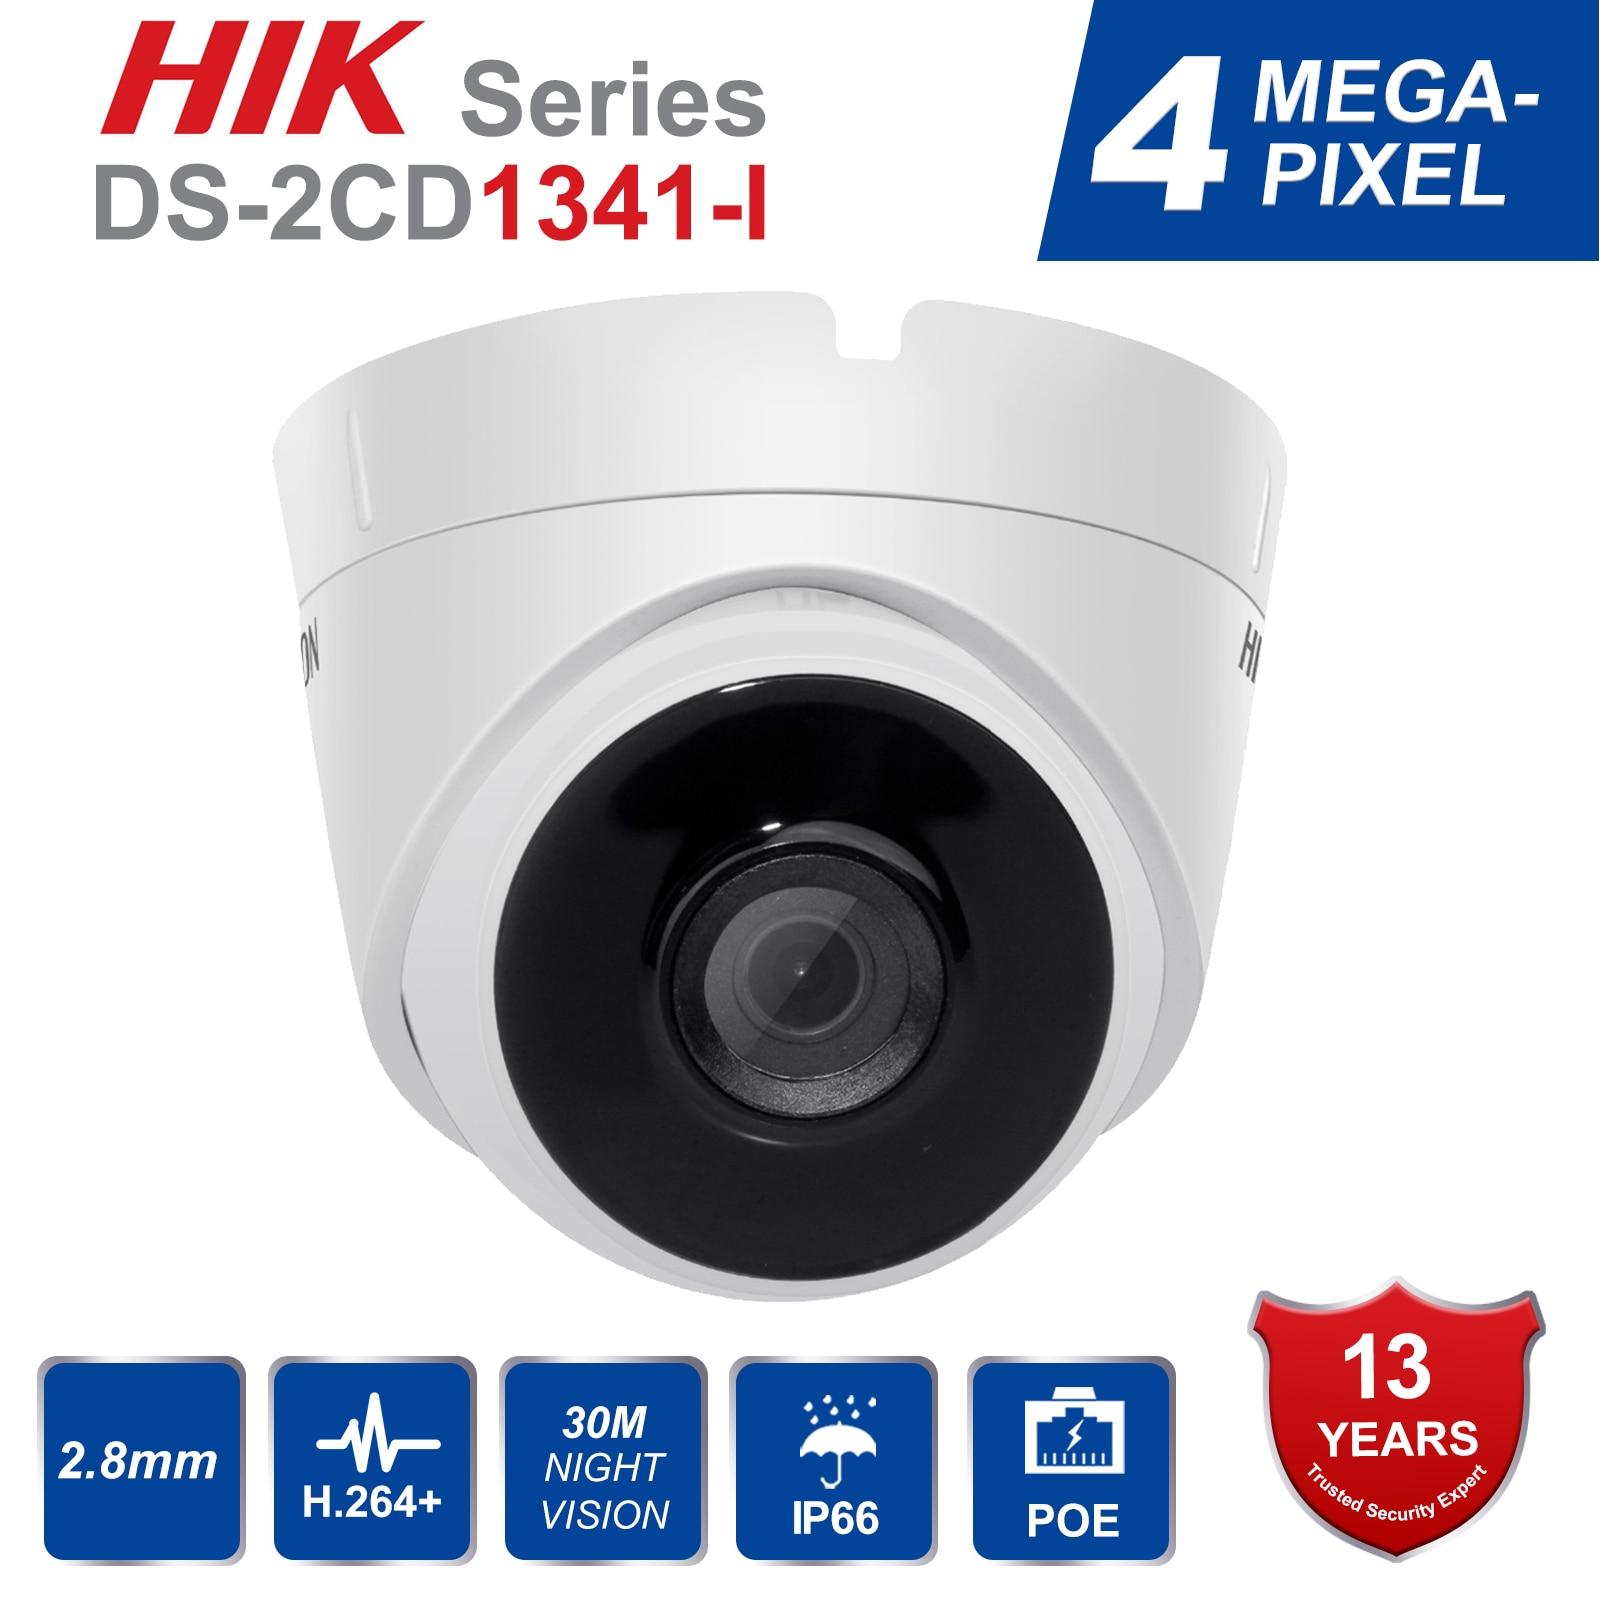 Original Hik Security Dome Camera DS 2CD1341 I 4MP CMOS Network Turret PoE IP Camera with